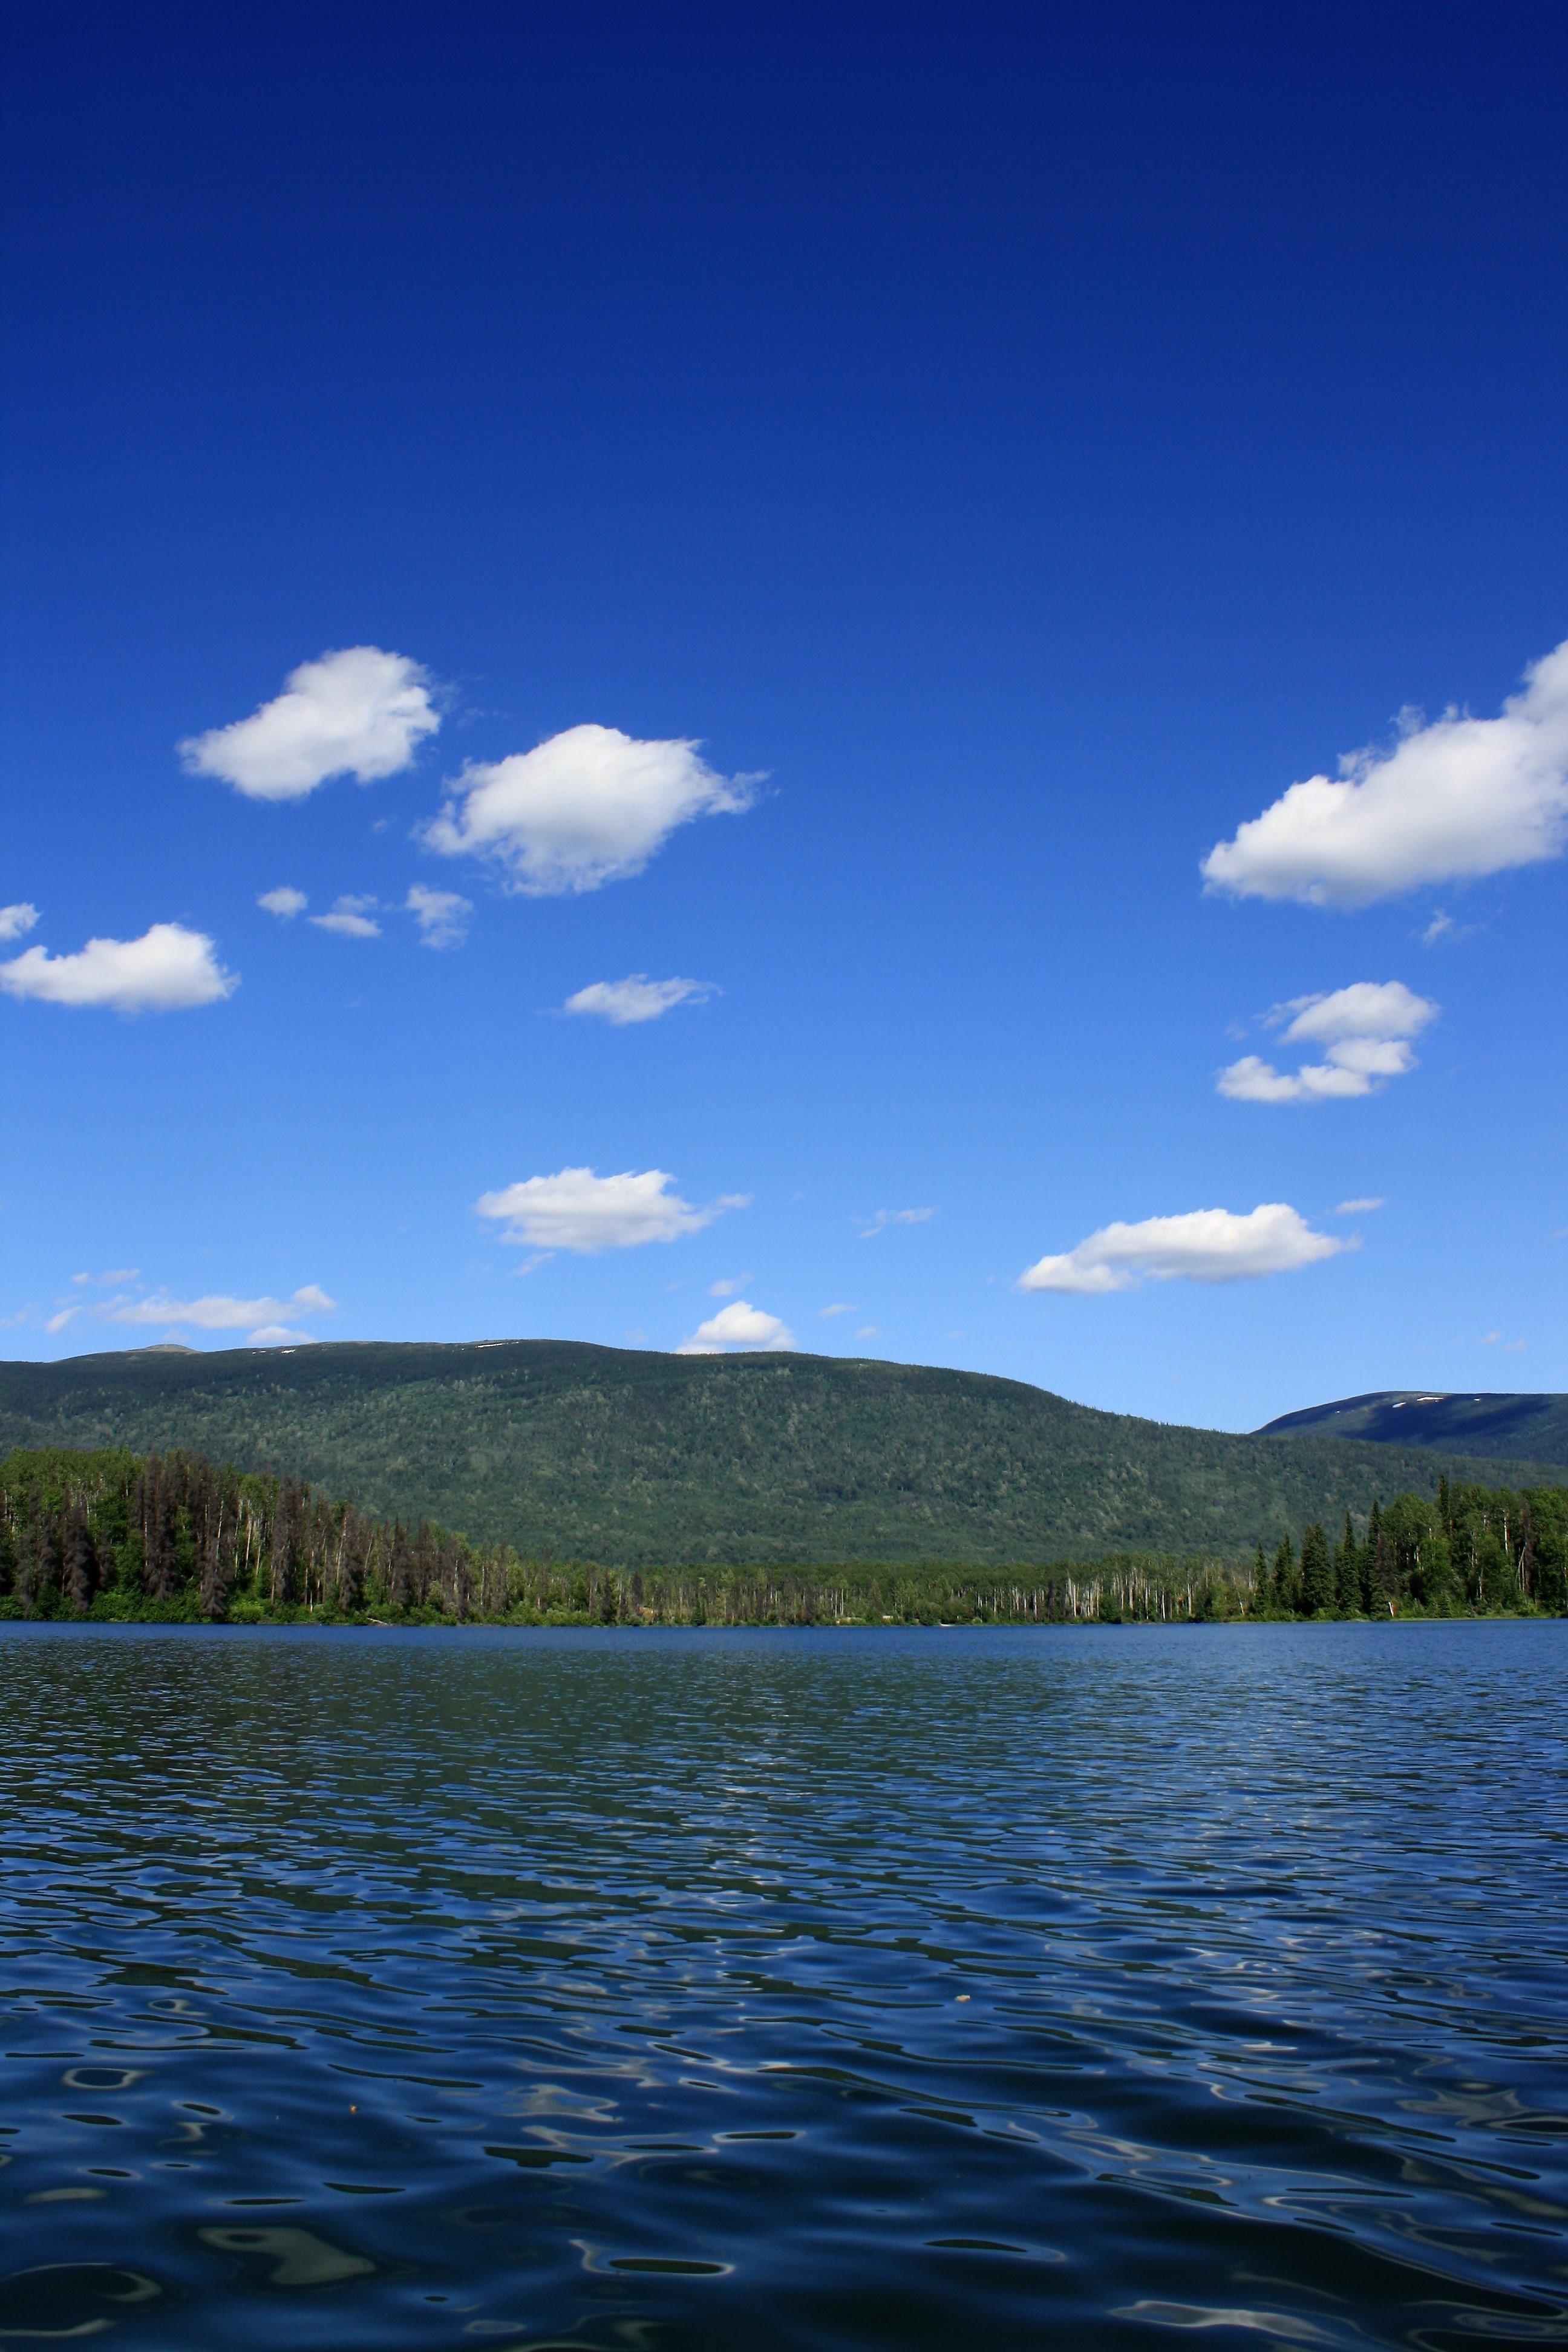 DM_nature_landscape_oceanwater_nelson_20